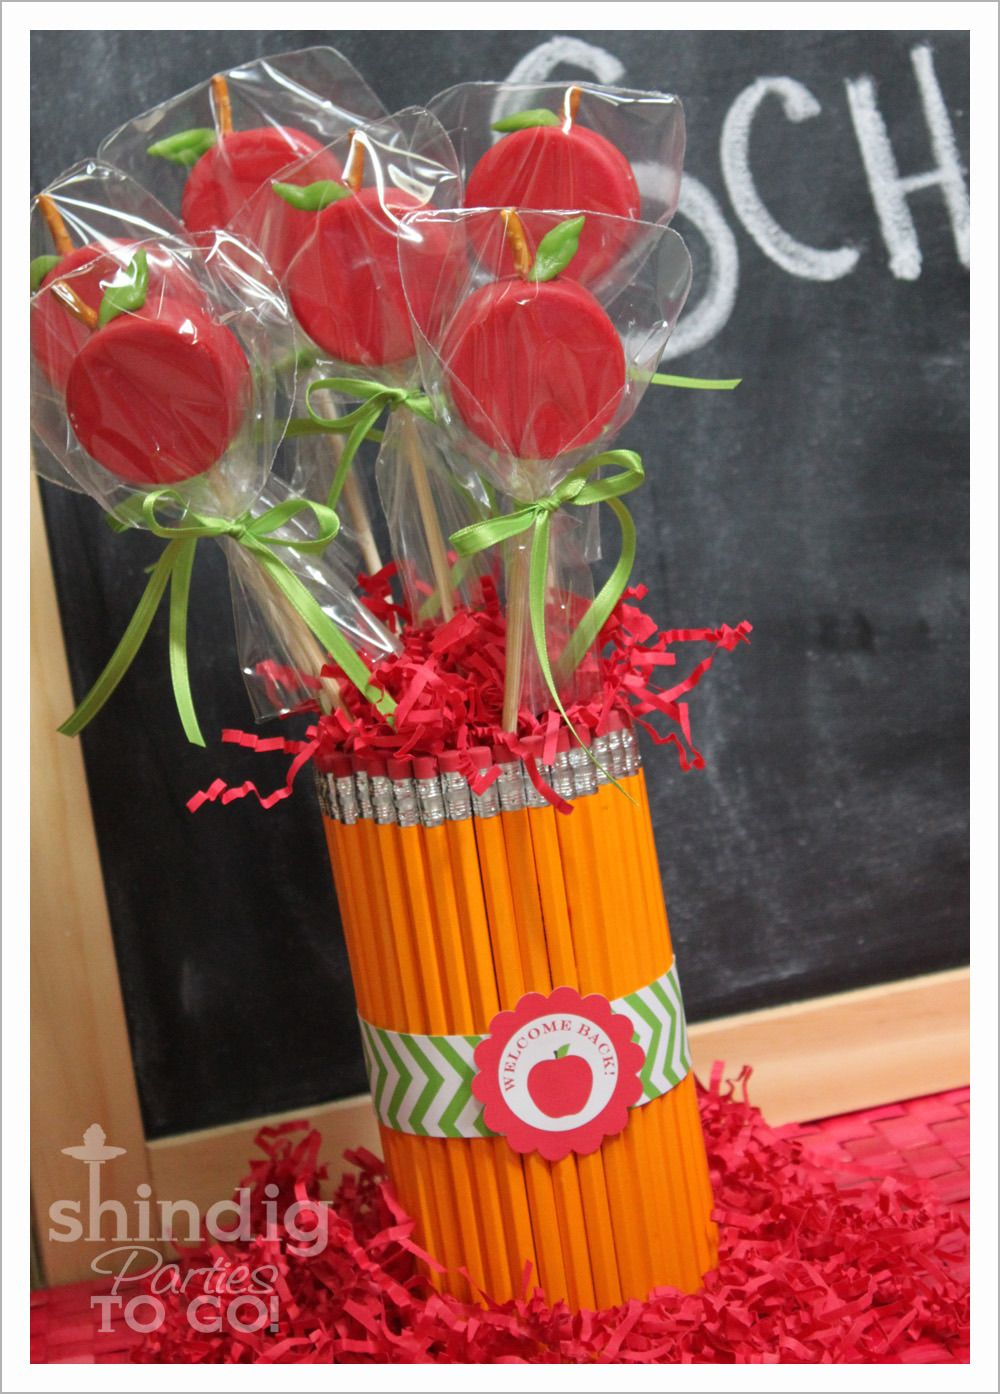 For teacher appreciation day